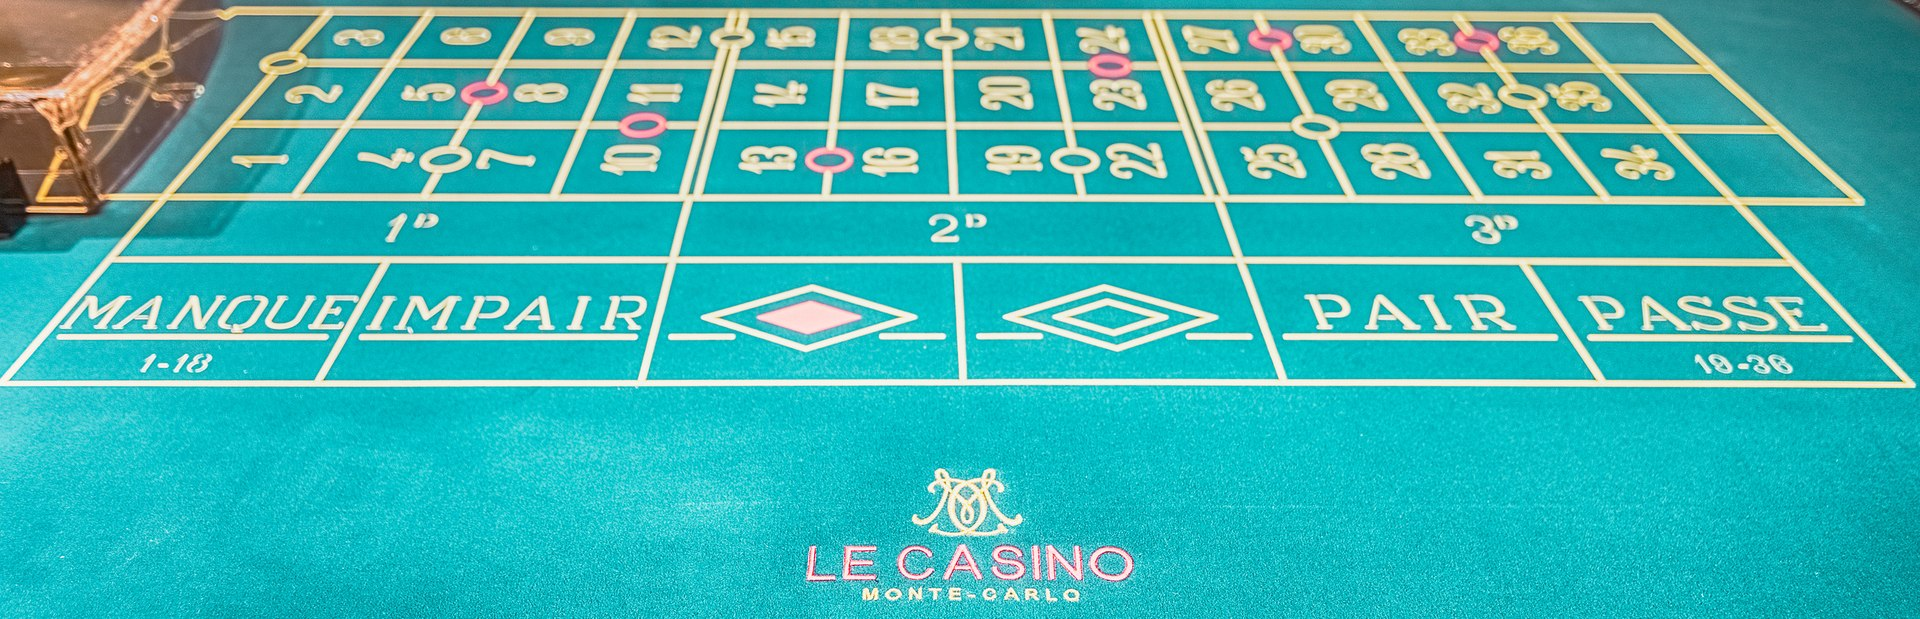 Monaco inspiration and tips